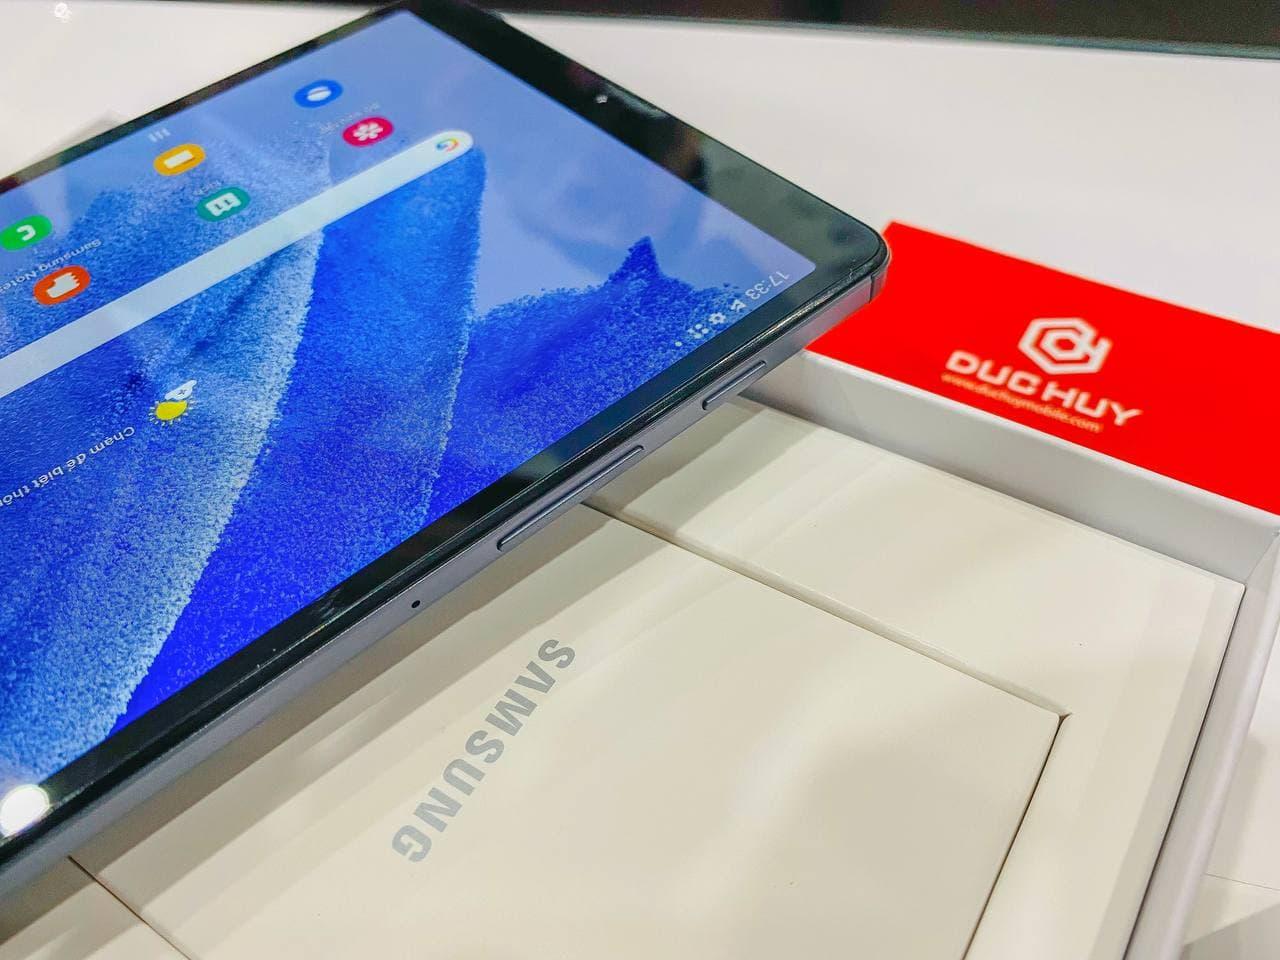 cạnh bên Samsung Galaxy Tab A7 Lite